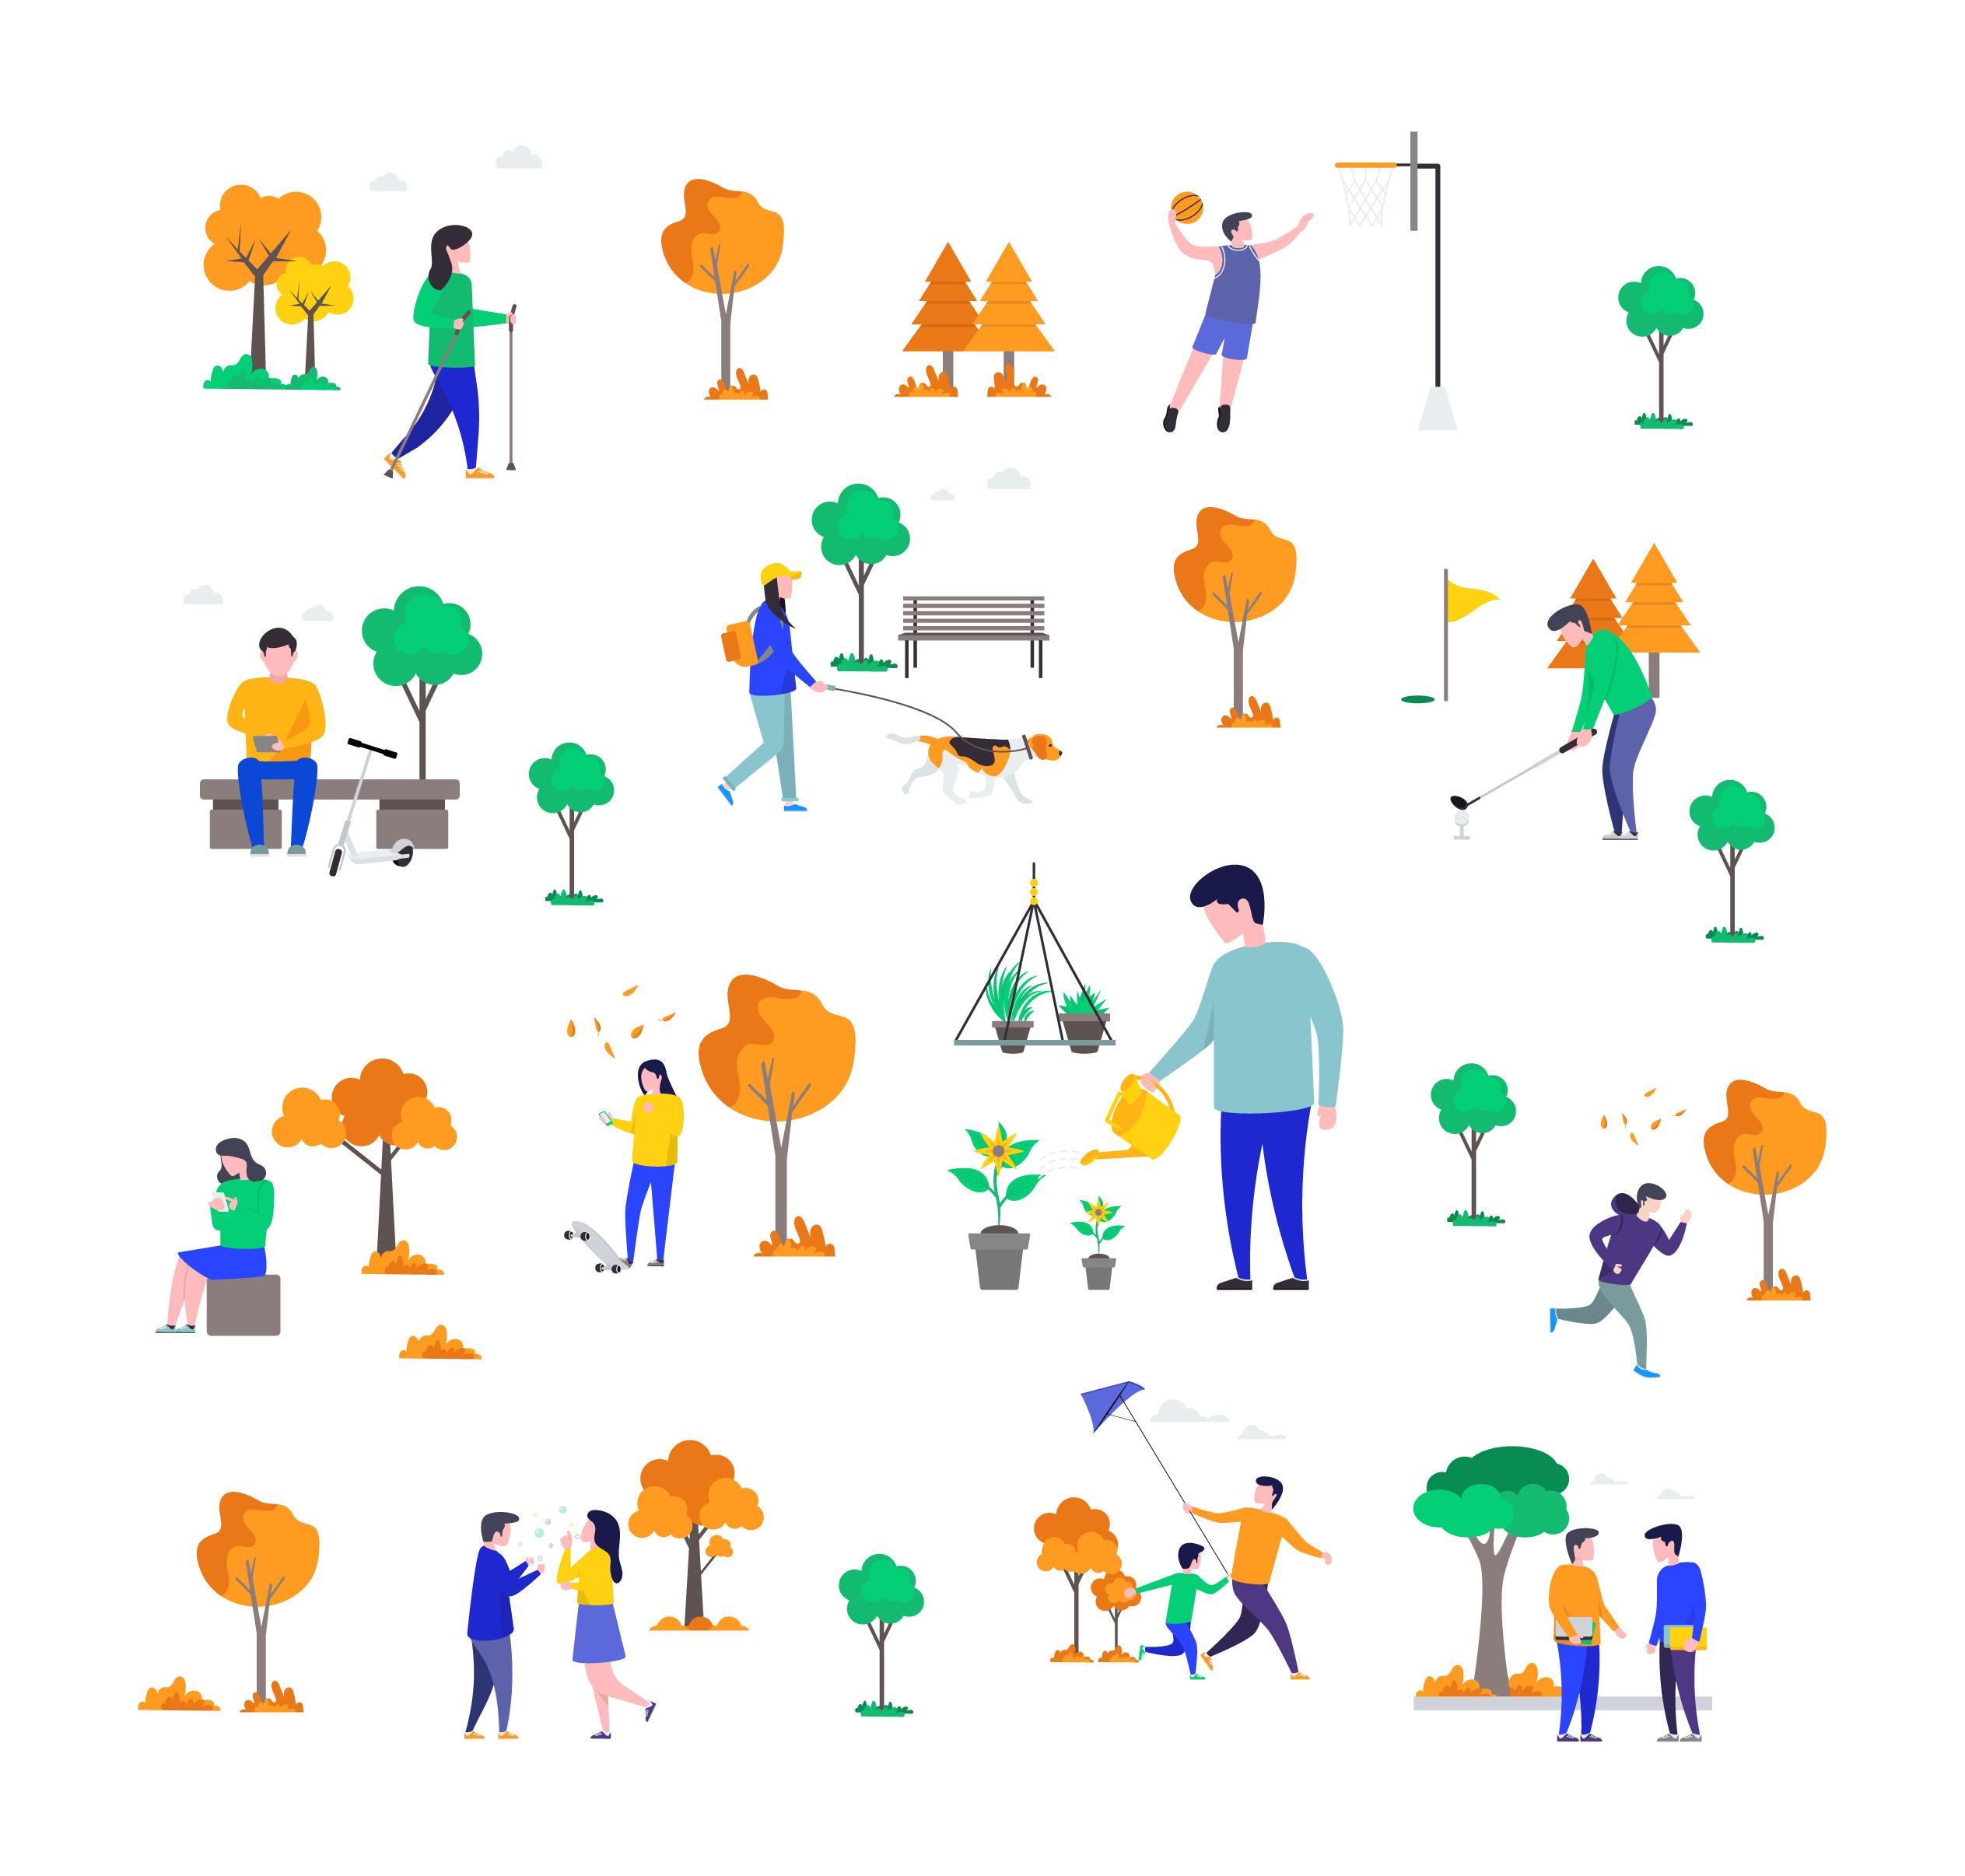 Human Activities Illustrations Set